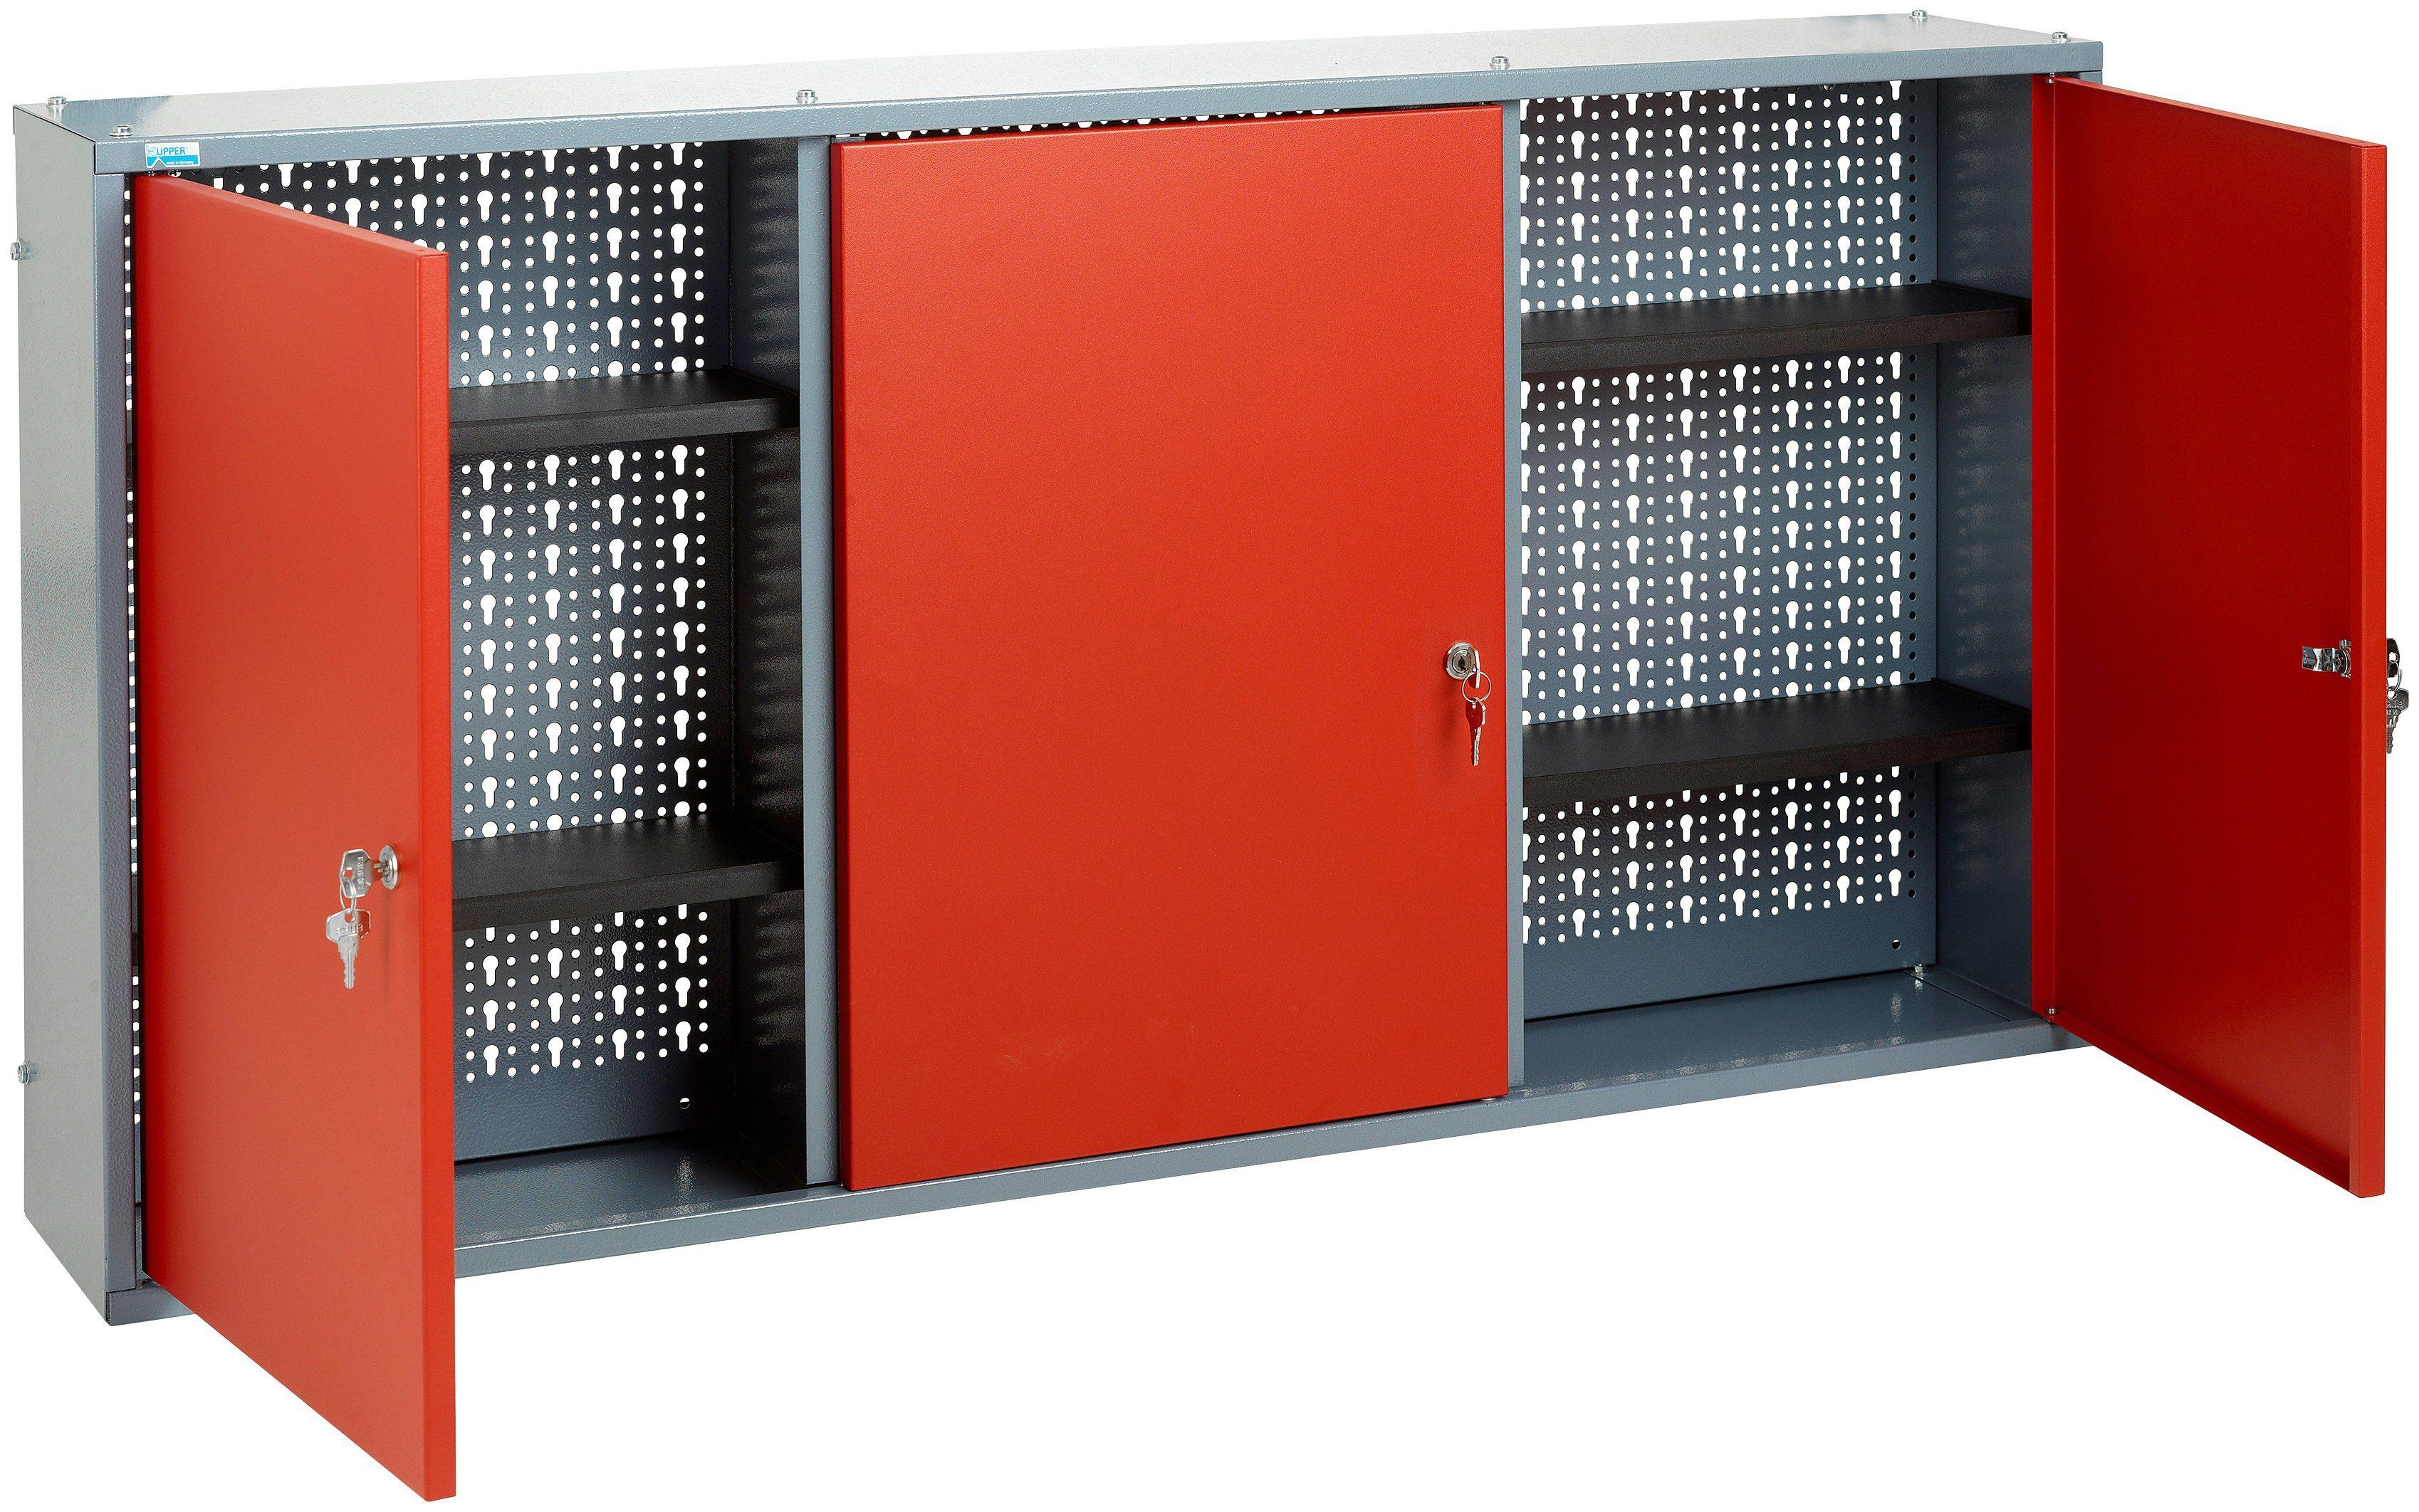 KÜPPER Hängeschrank »3 Türen, 4 Einlegeböden, in rot«